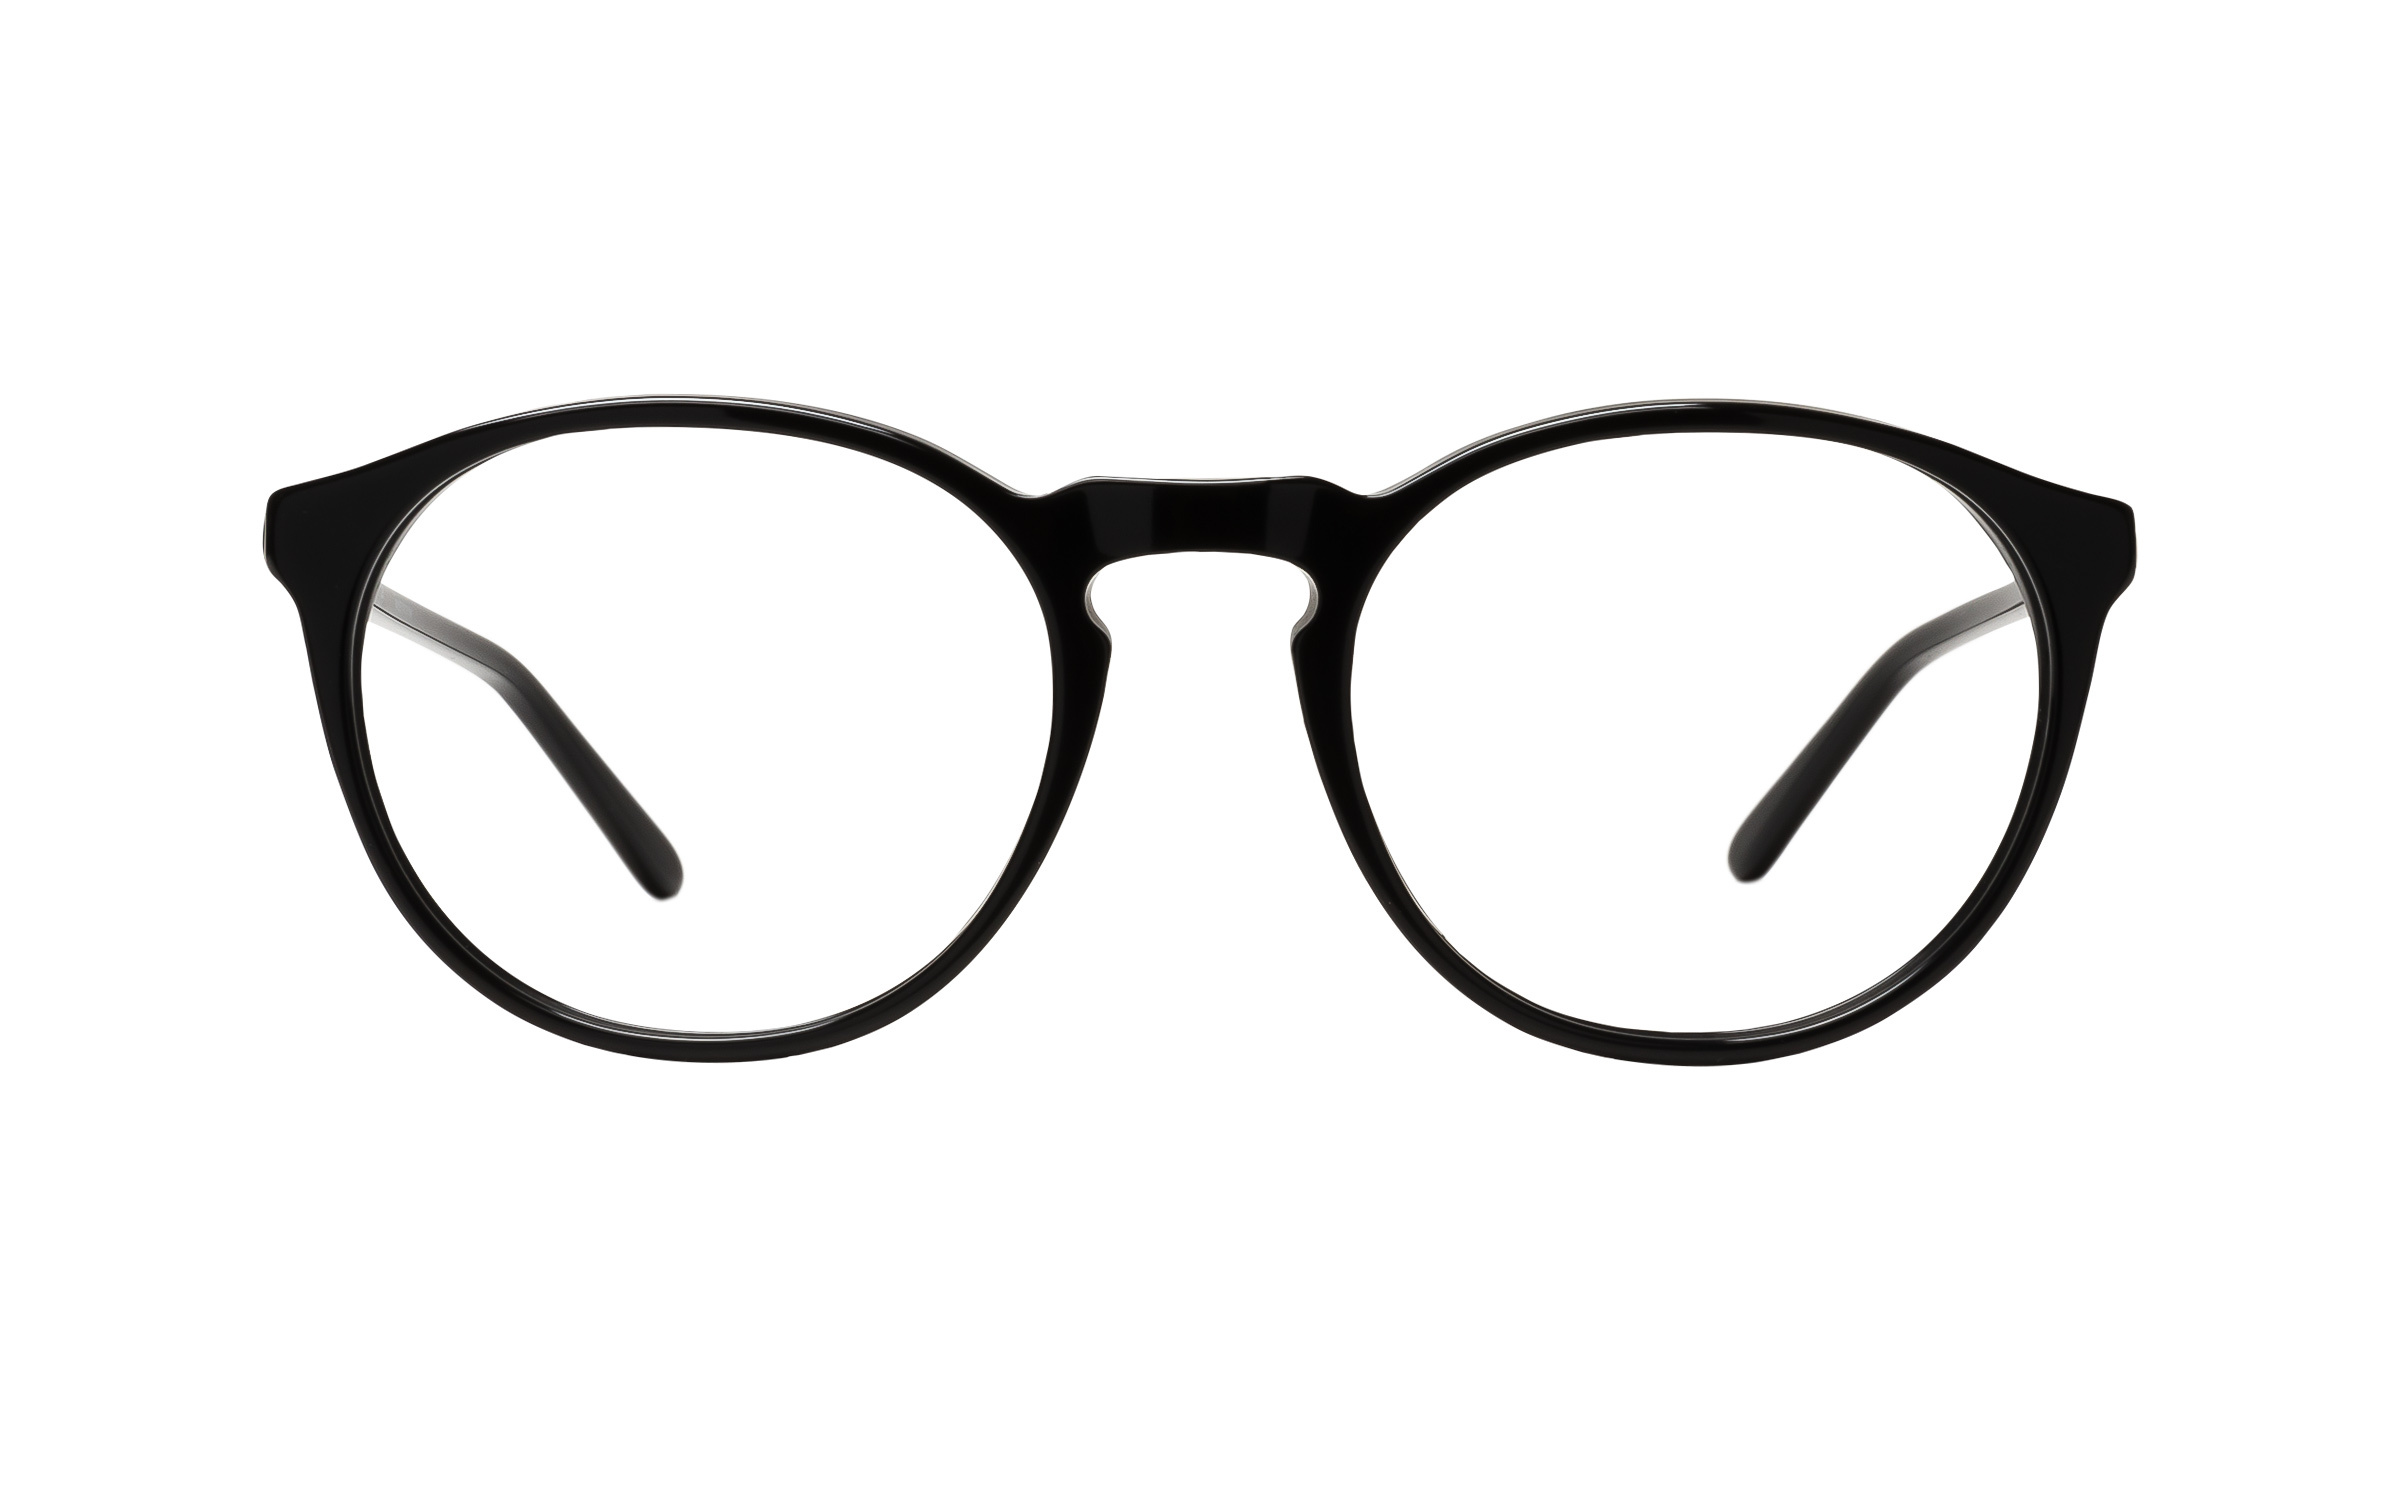 Luxottica Polo Ralph Lauren PH2180 5001 (52) Eyeglasses and Frame in Black - Online Coastal